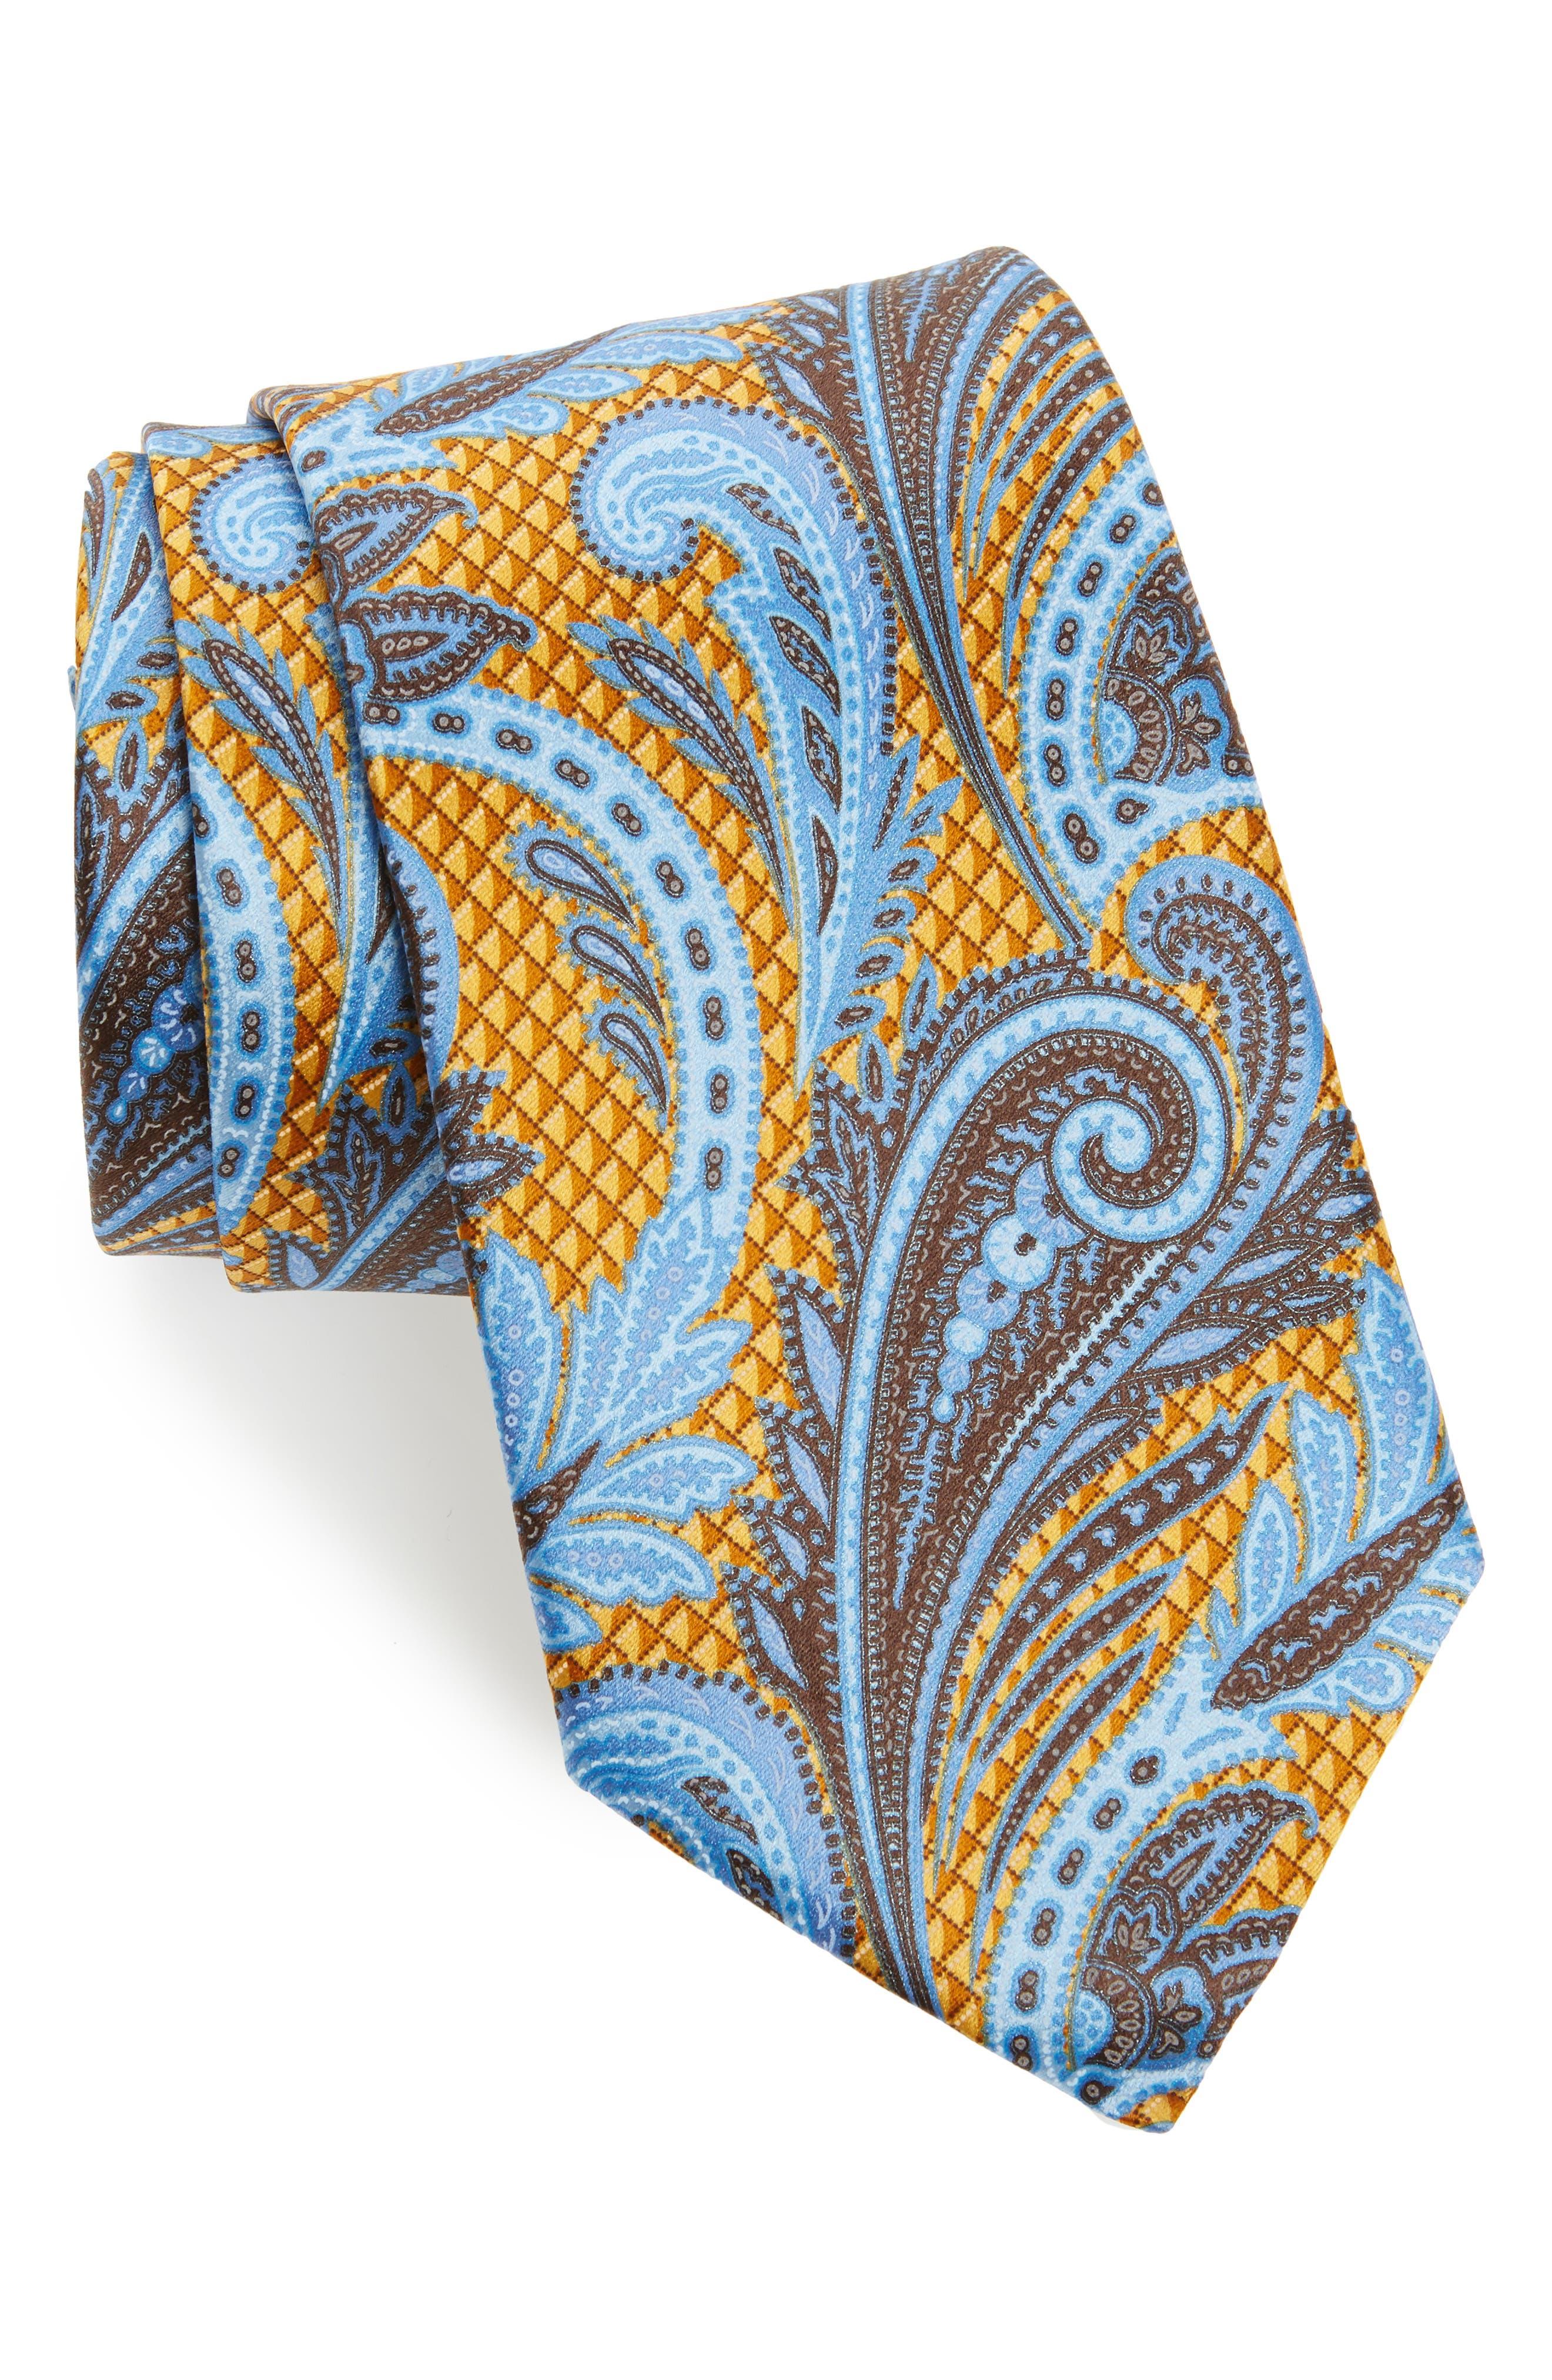 Main Image - Ermenegildo Zegna Paisley Floral Silk Tie